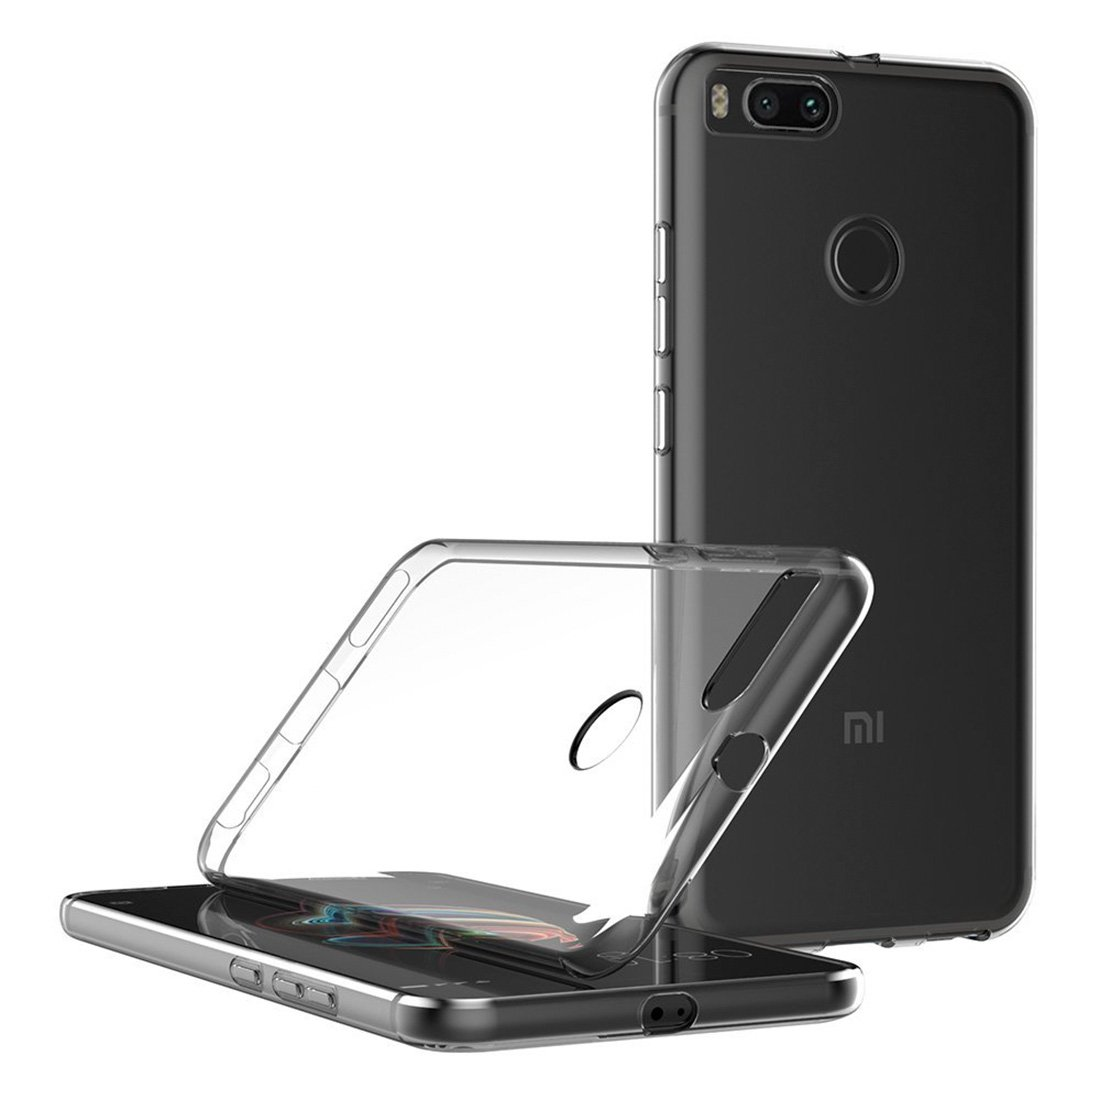 Funda + Vidrio Templado Cristal para Xiaomi Mi A1 Leathlux Transparente TPU Silicona Ultra Fino Protector de Pantalla 9H Dureza HD y Flexible Back Case Cover para Xiaomi Mi A1 // Mi 5X 5.5 Funda